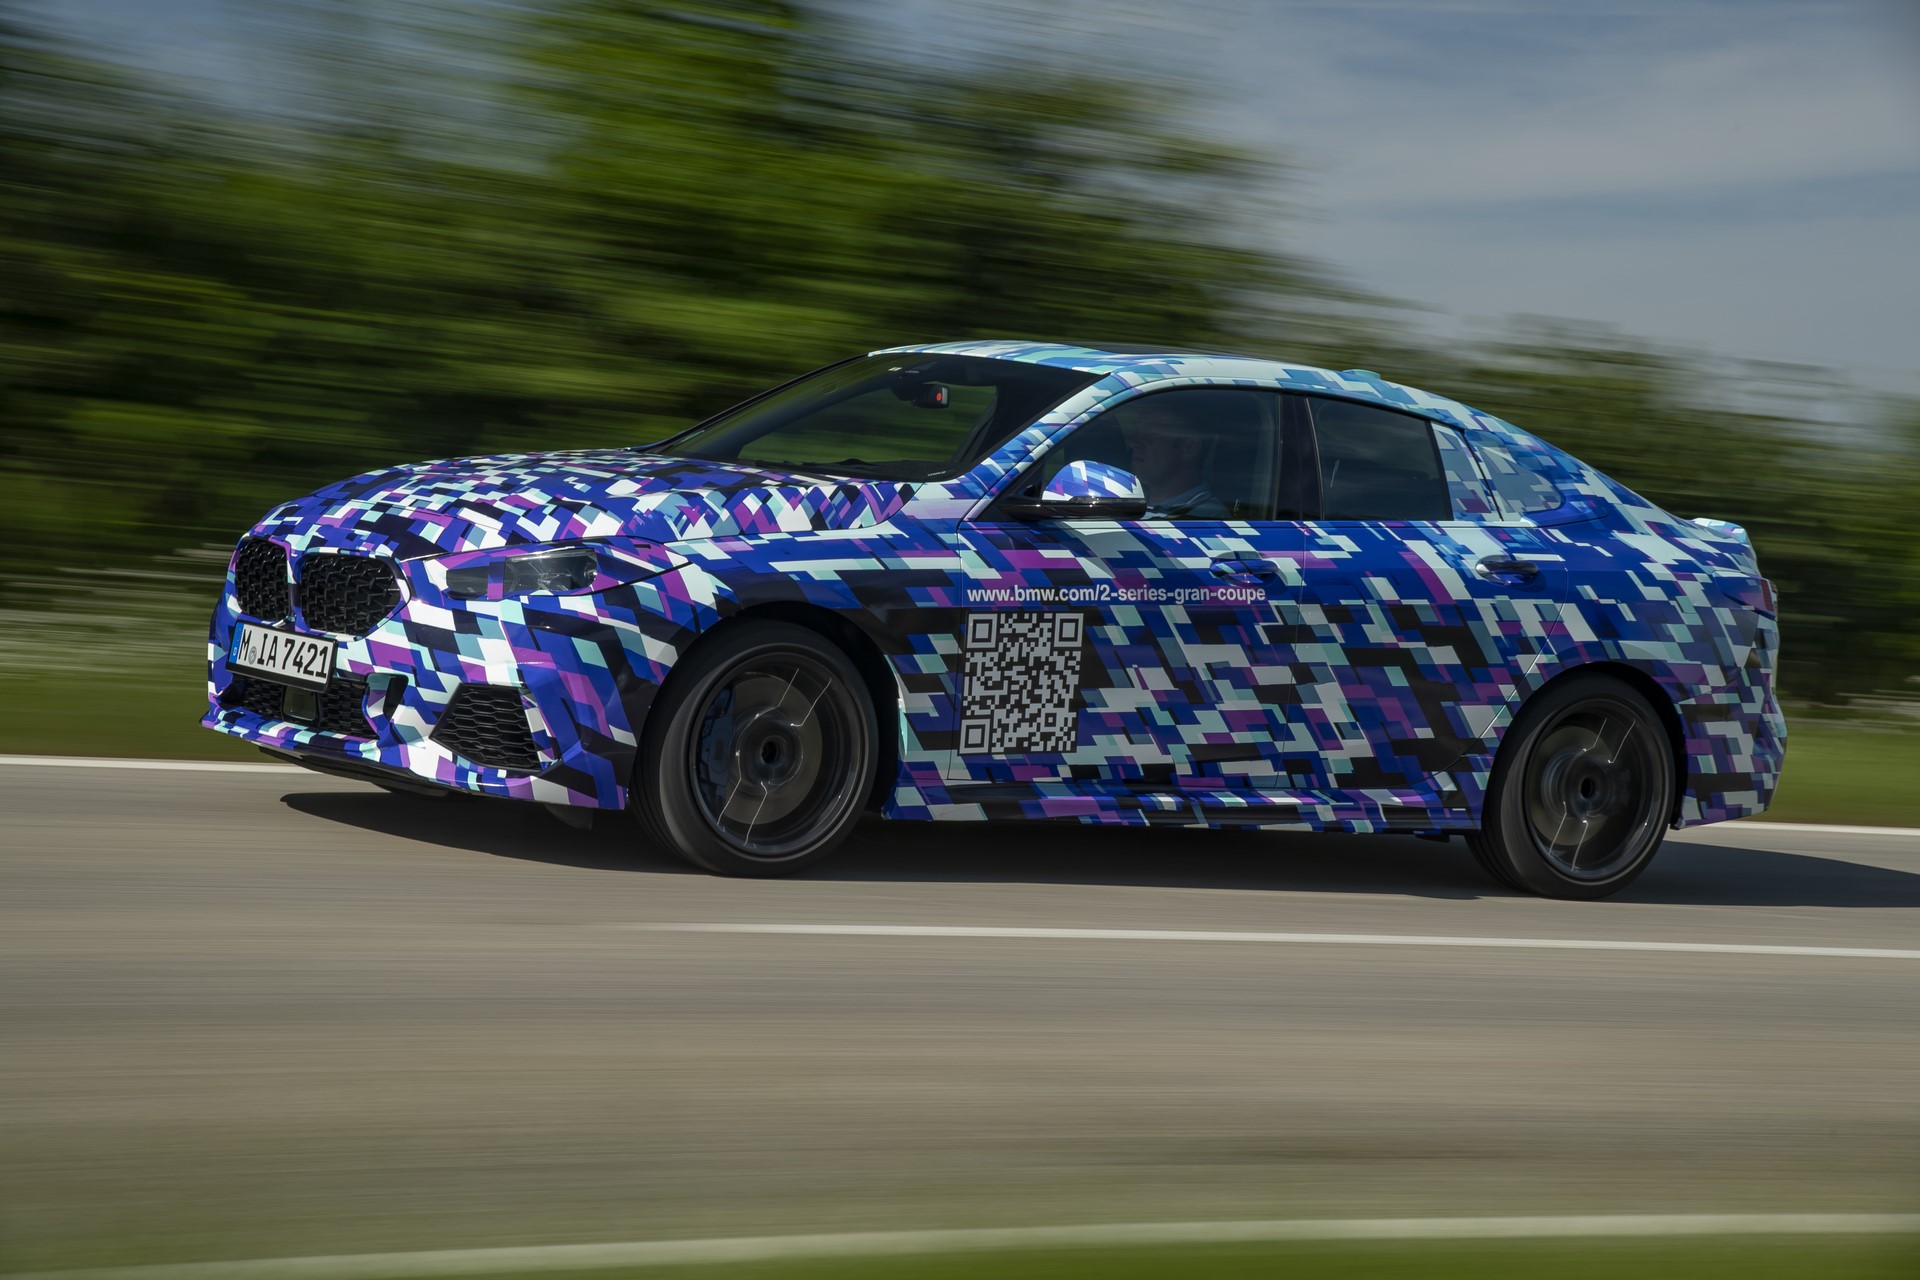 BMW-2-Series-Gran-Coupe-2020-spy-photos-28